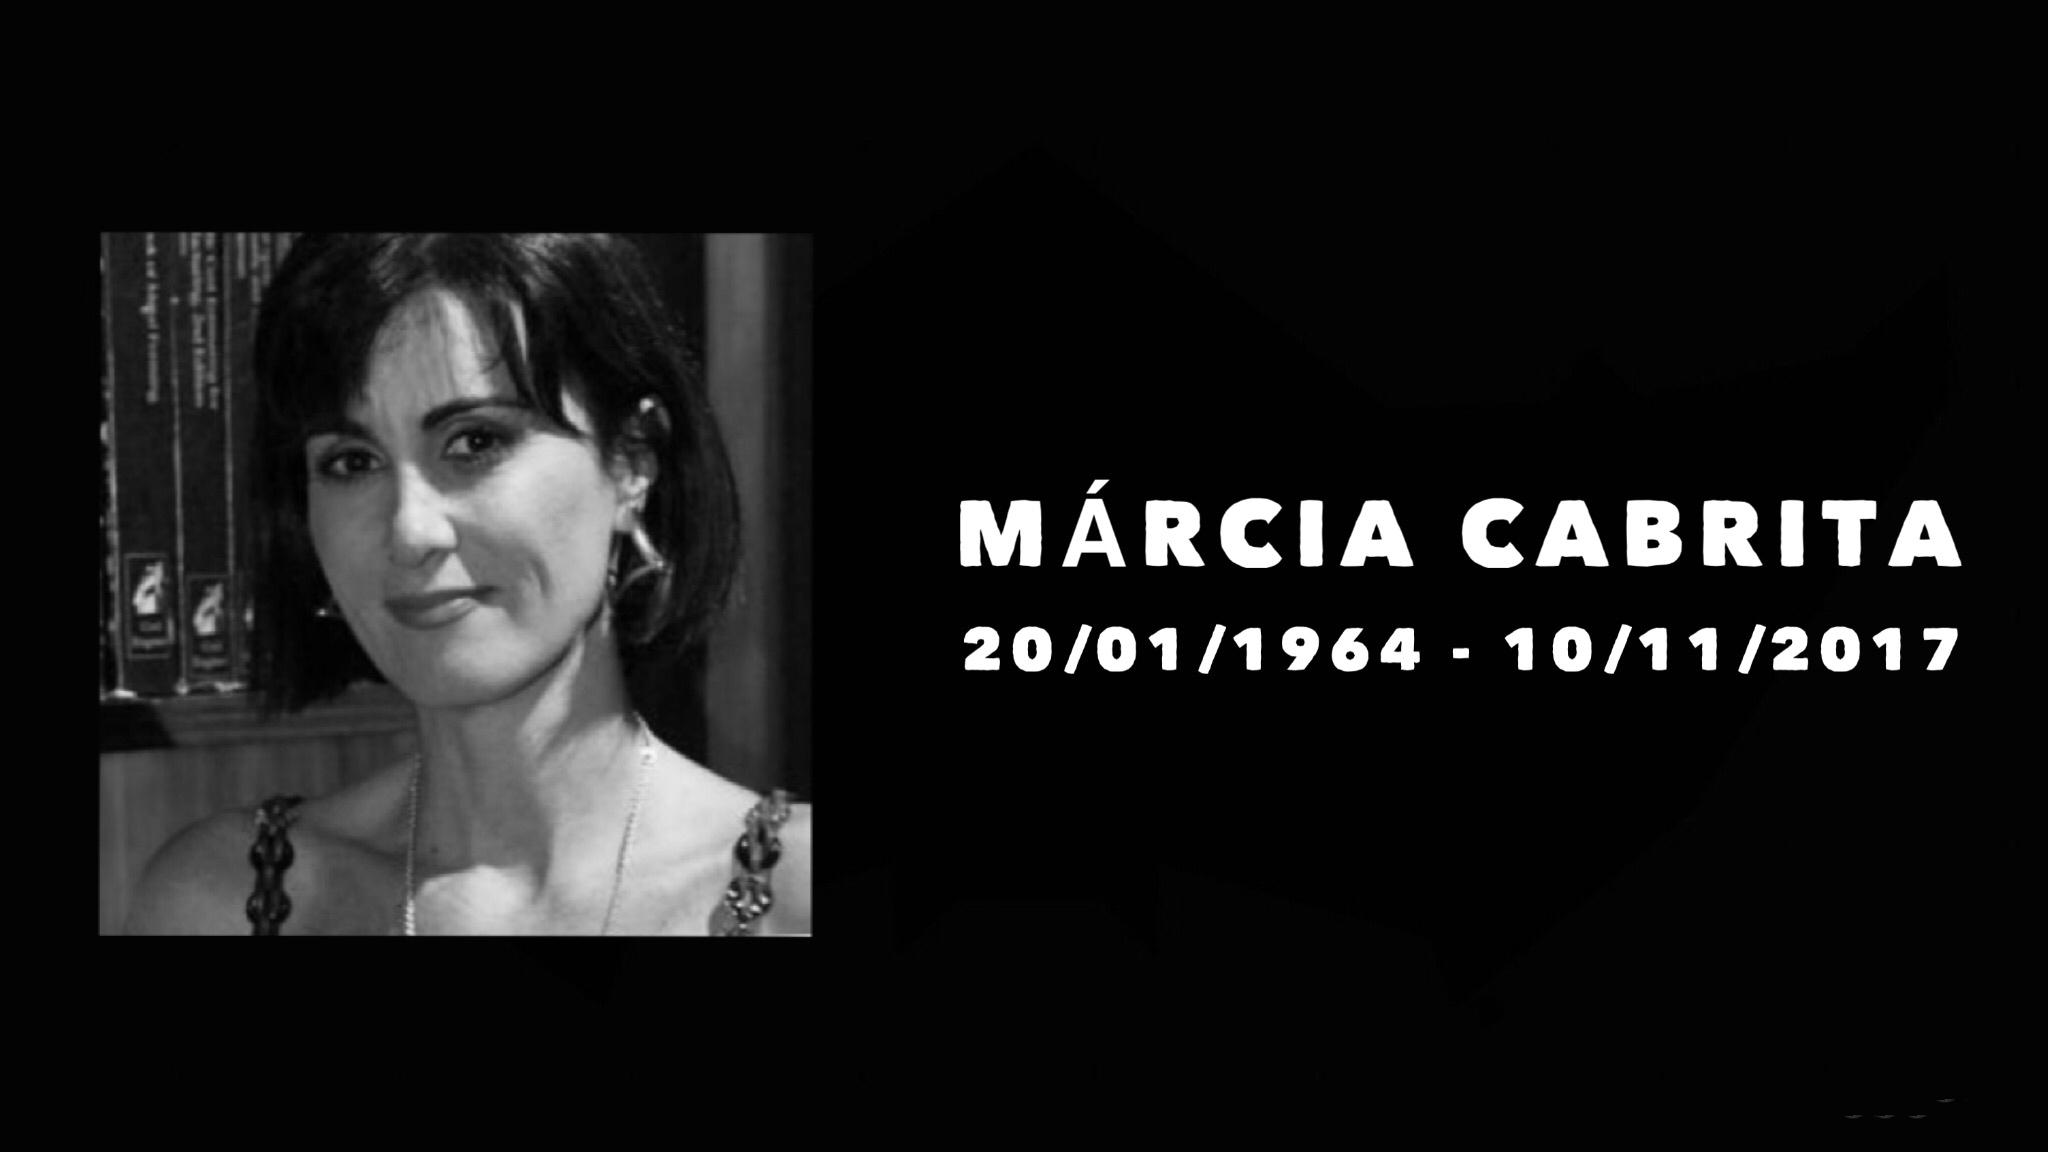 Morre aos 53 anos a atriz e humorista Márcia Cabrita 3